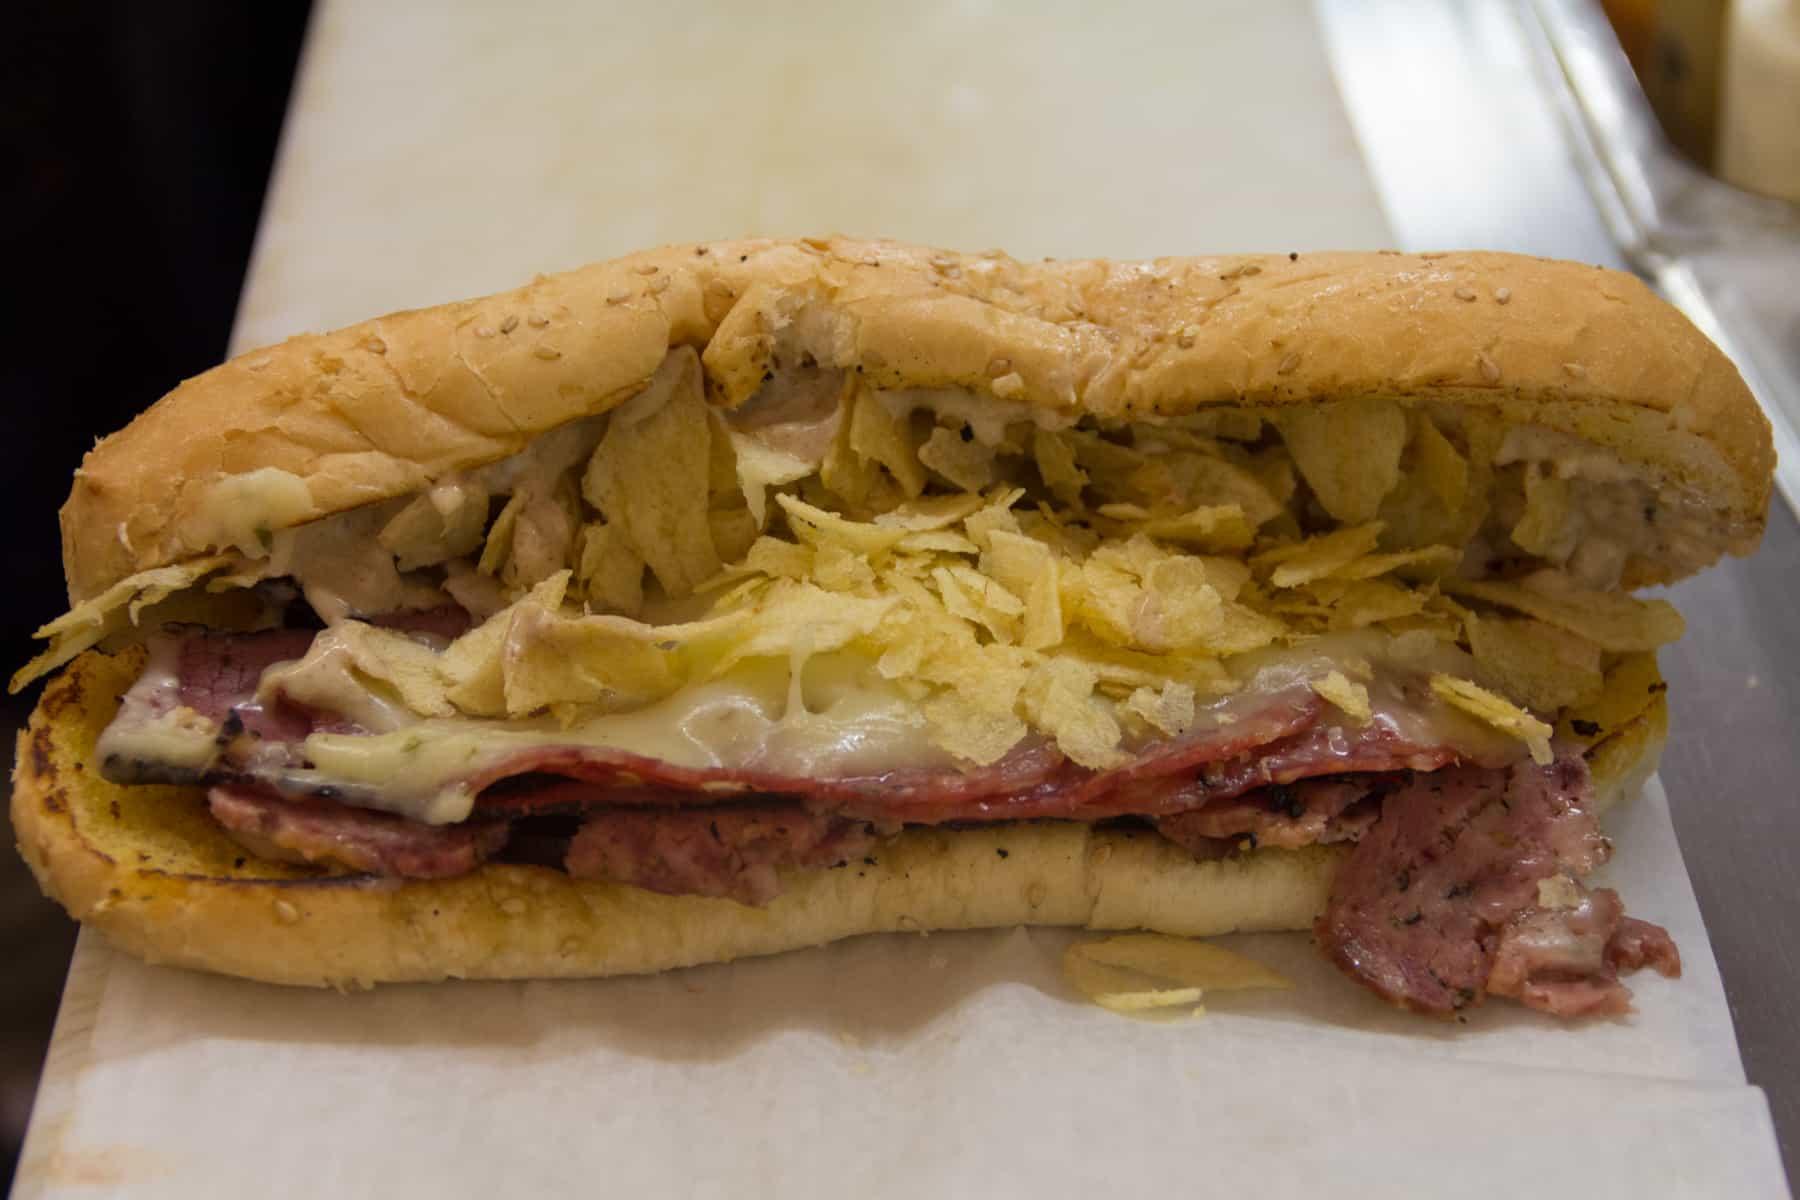 Jaworski Meats The Beast signature sandwich Chimaira